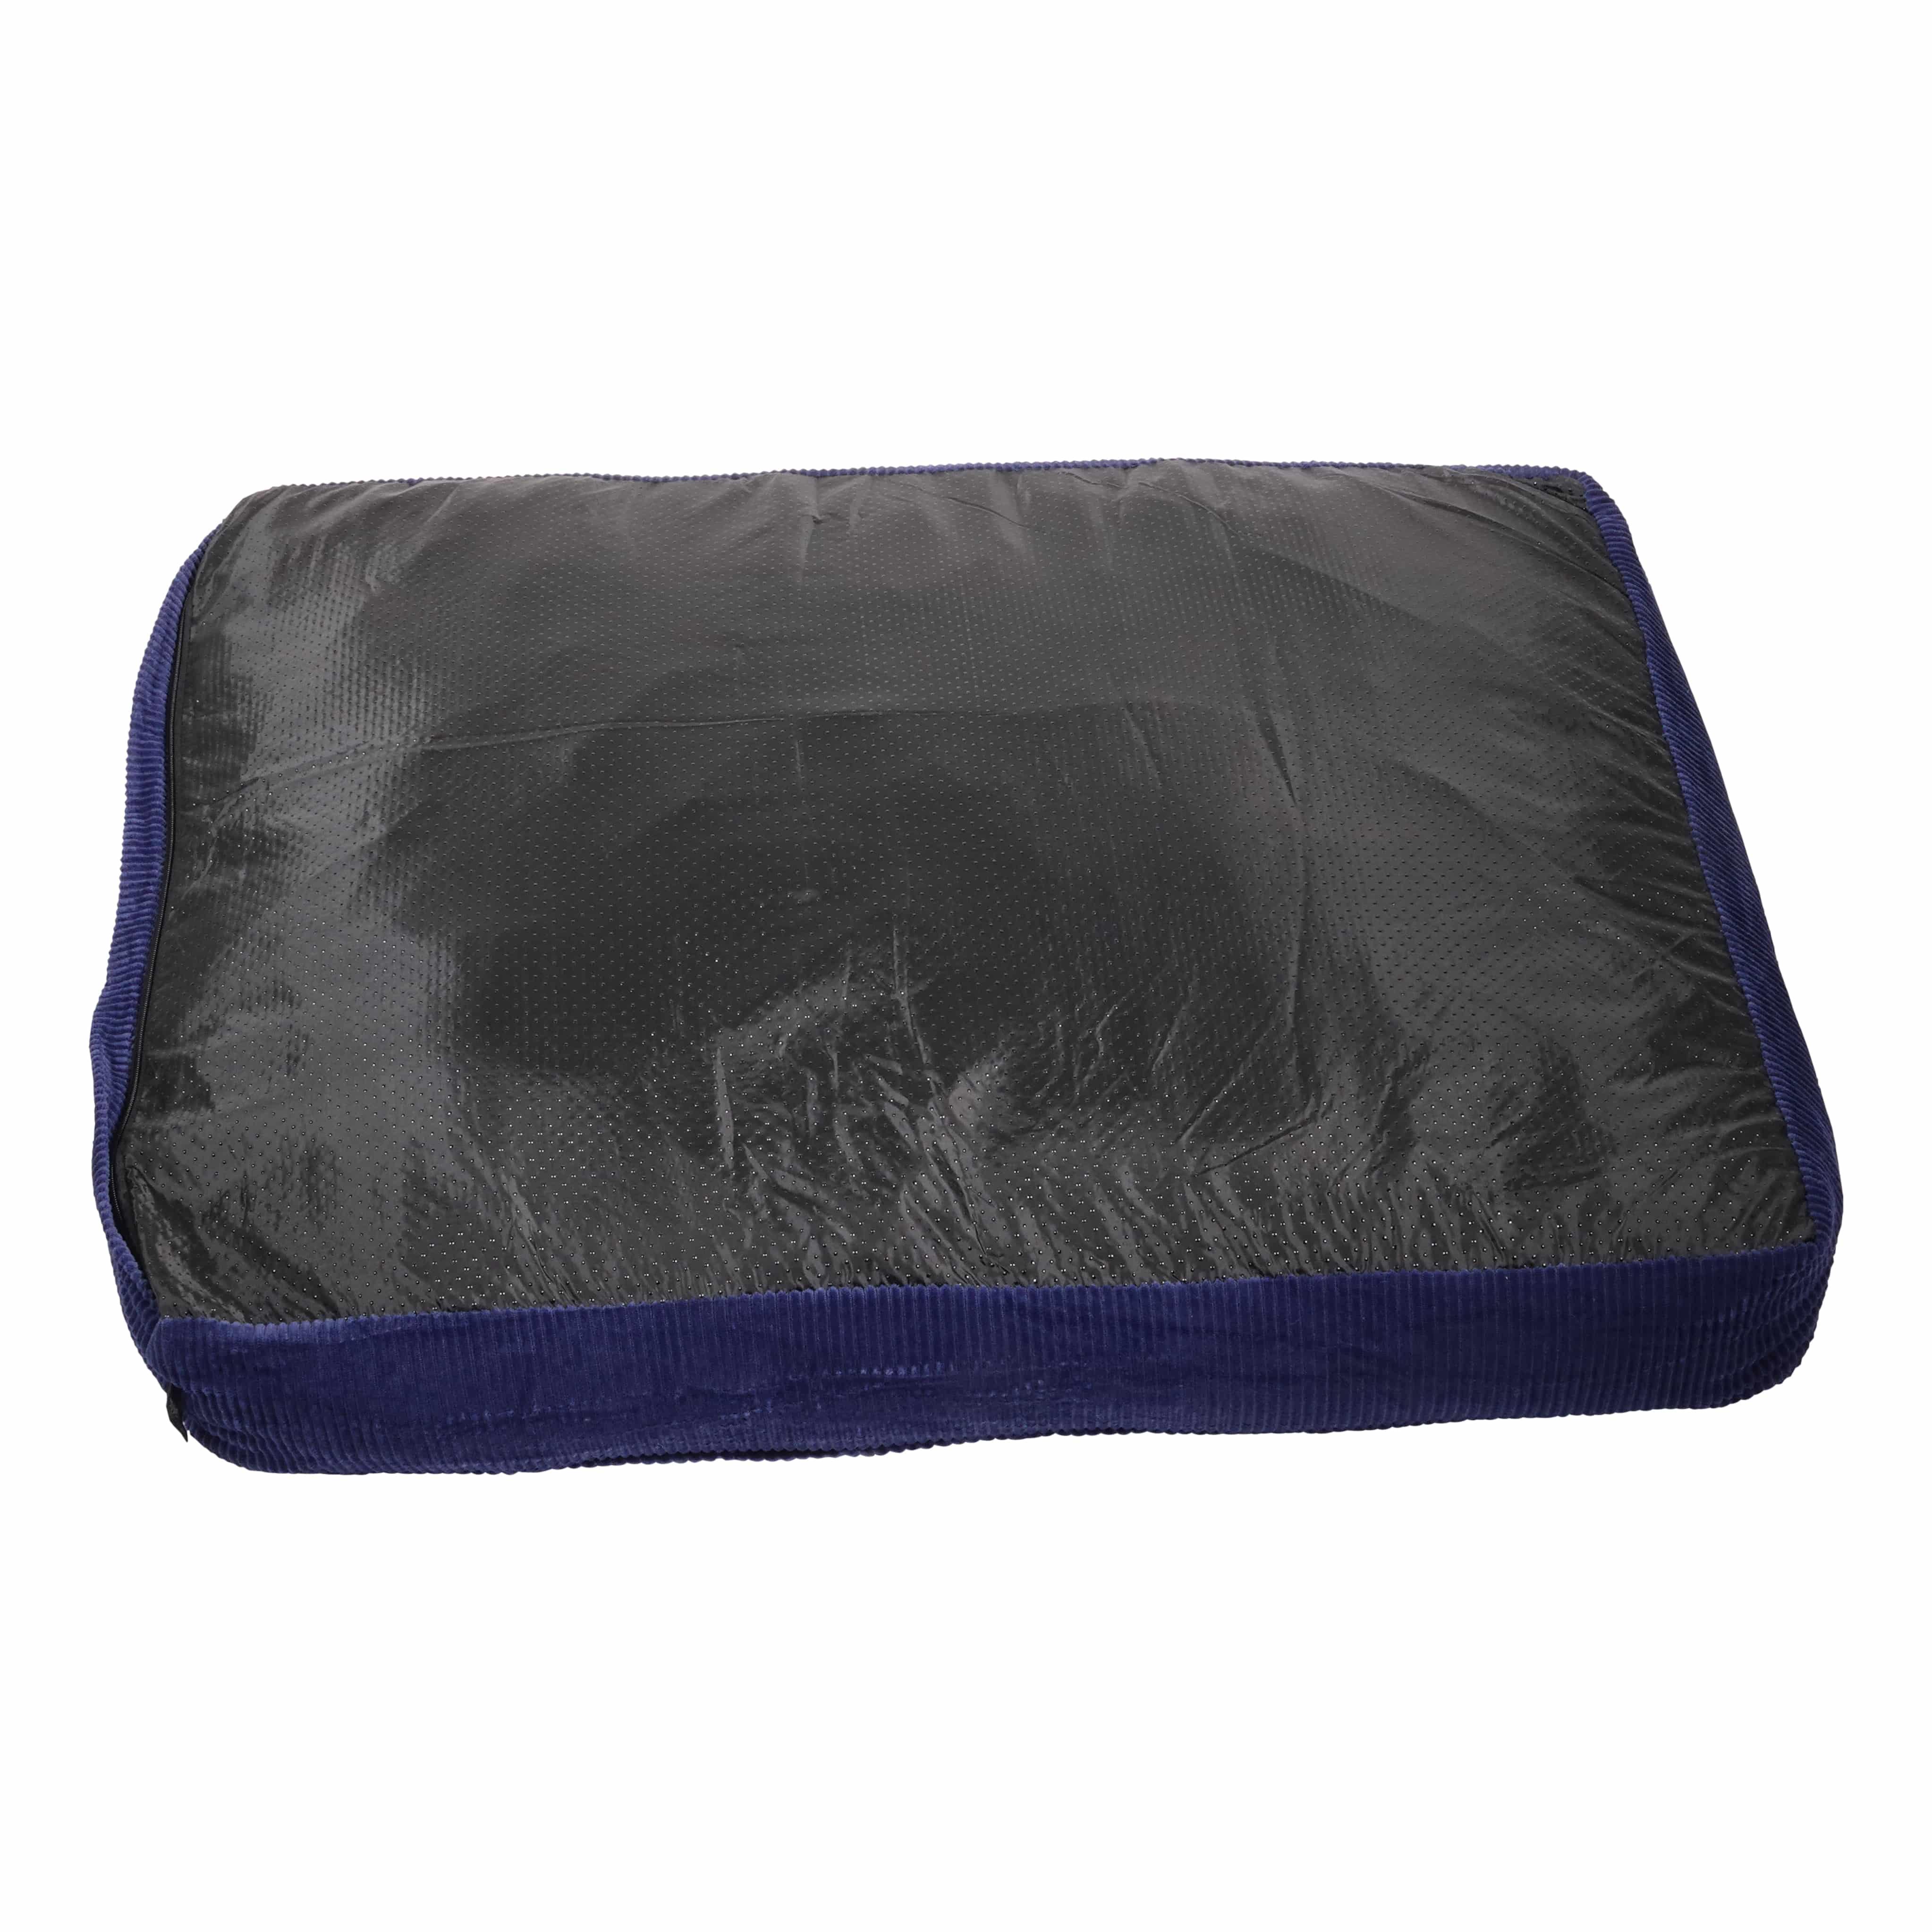 4Goodz hondenkussen rechthoek velours 70x90x15 cm - Blauw